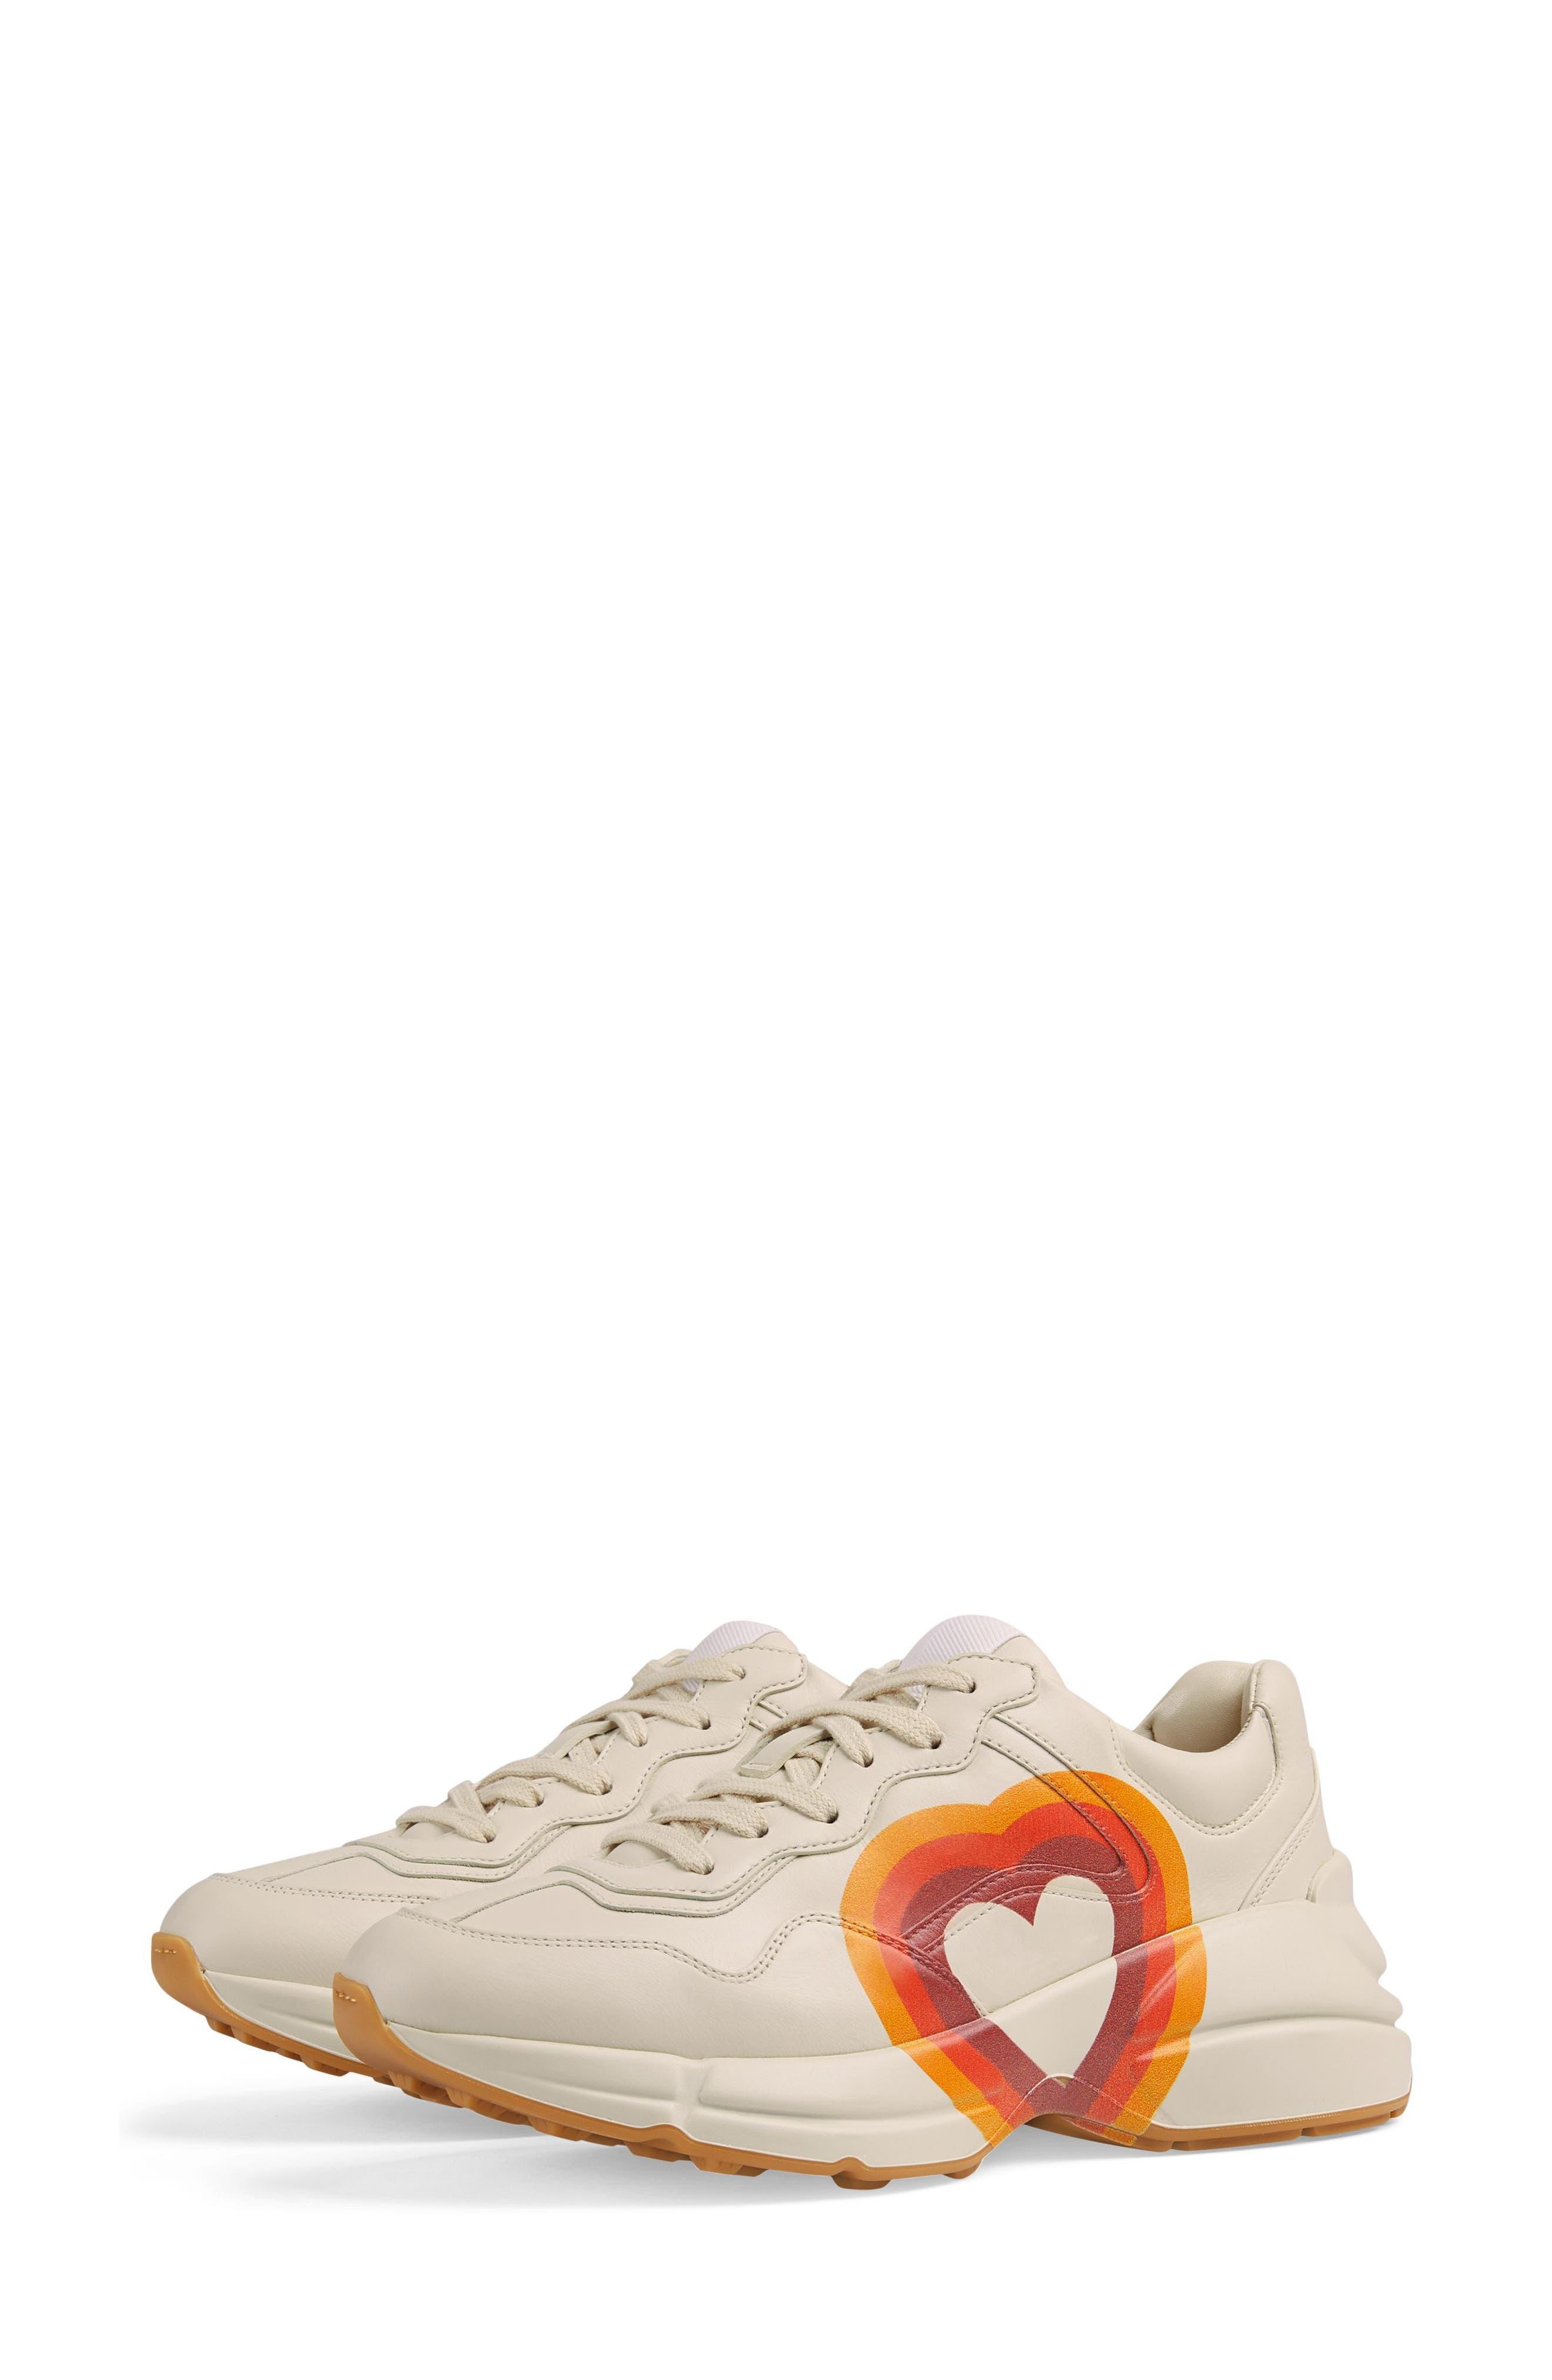 Rhyton Double G Sneaker,                             Alternate thumbnail 6, color,                             MYSTIC WHITE